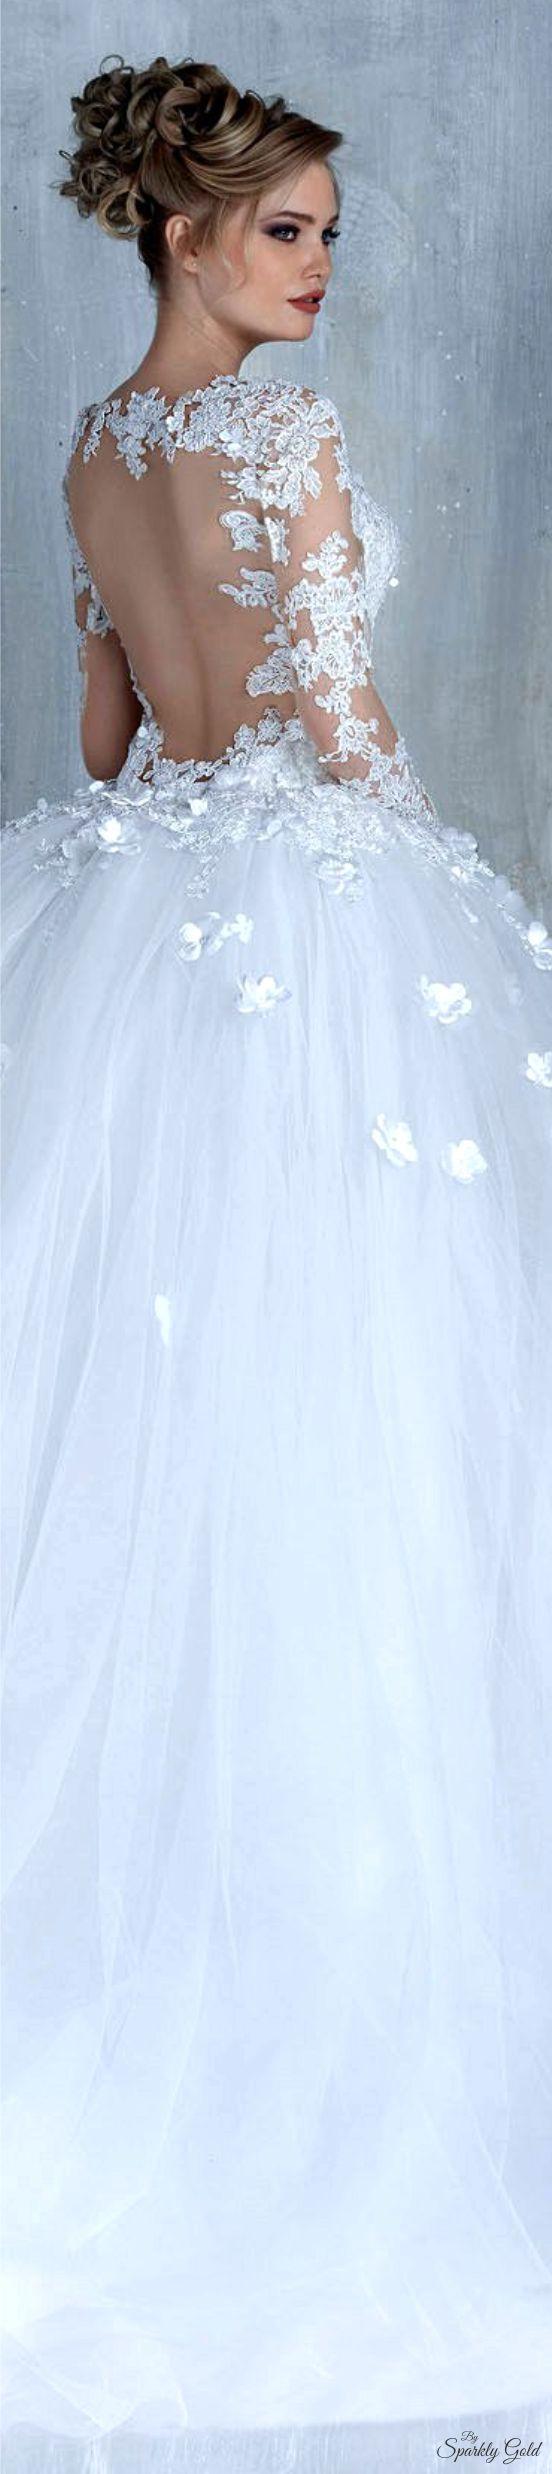 Winter wonderland wedding dress  Tony Chaaya Spring  Bridal  Unique Wedding Dresses  Pinterest